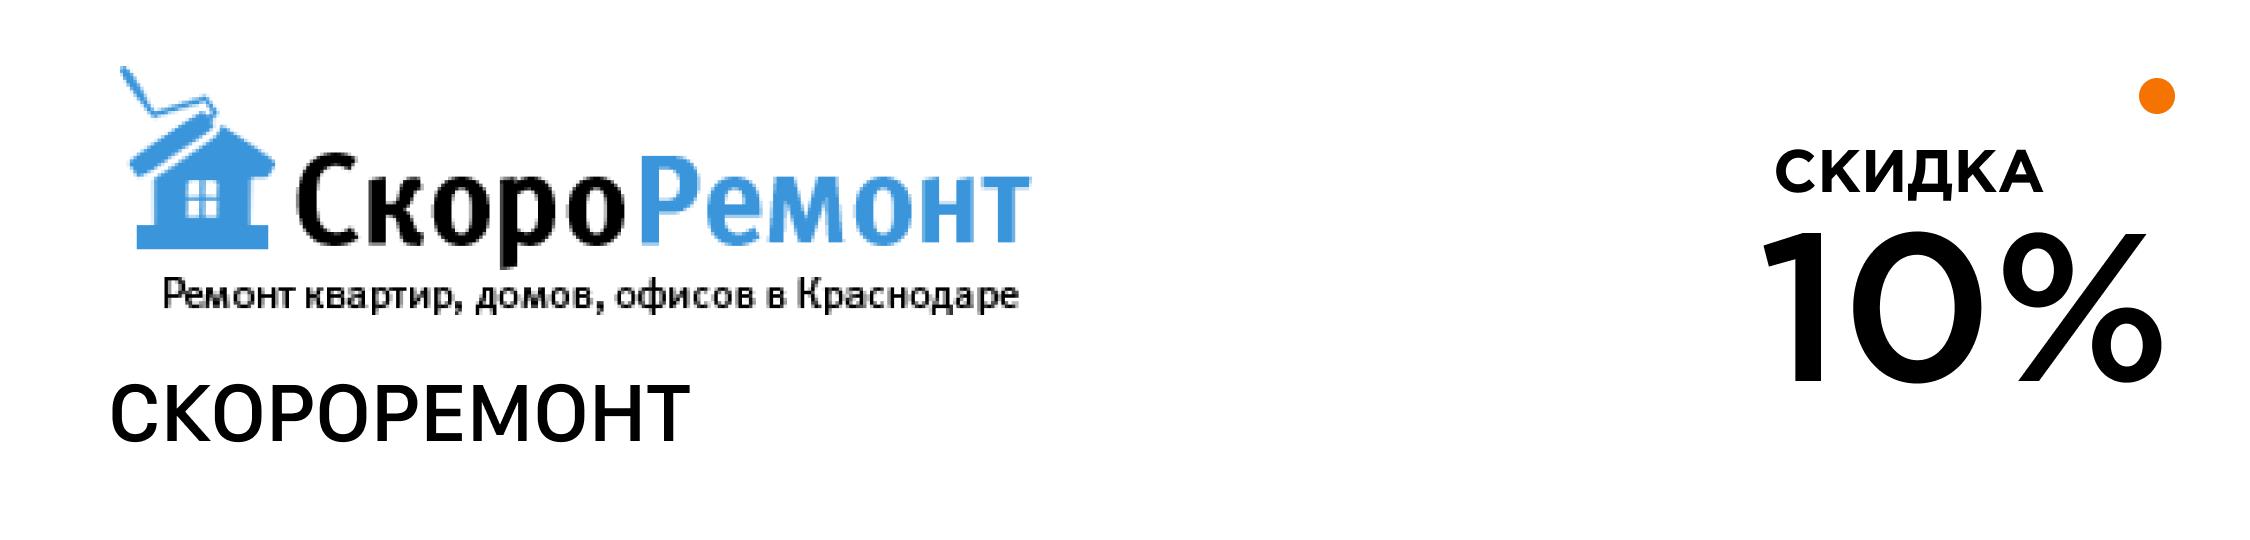 СкороРемонт